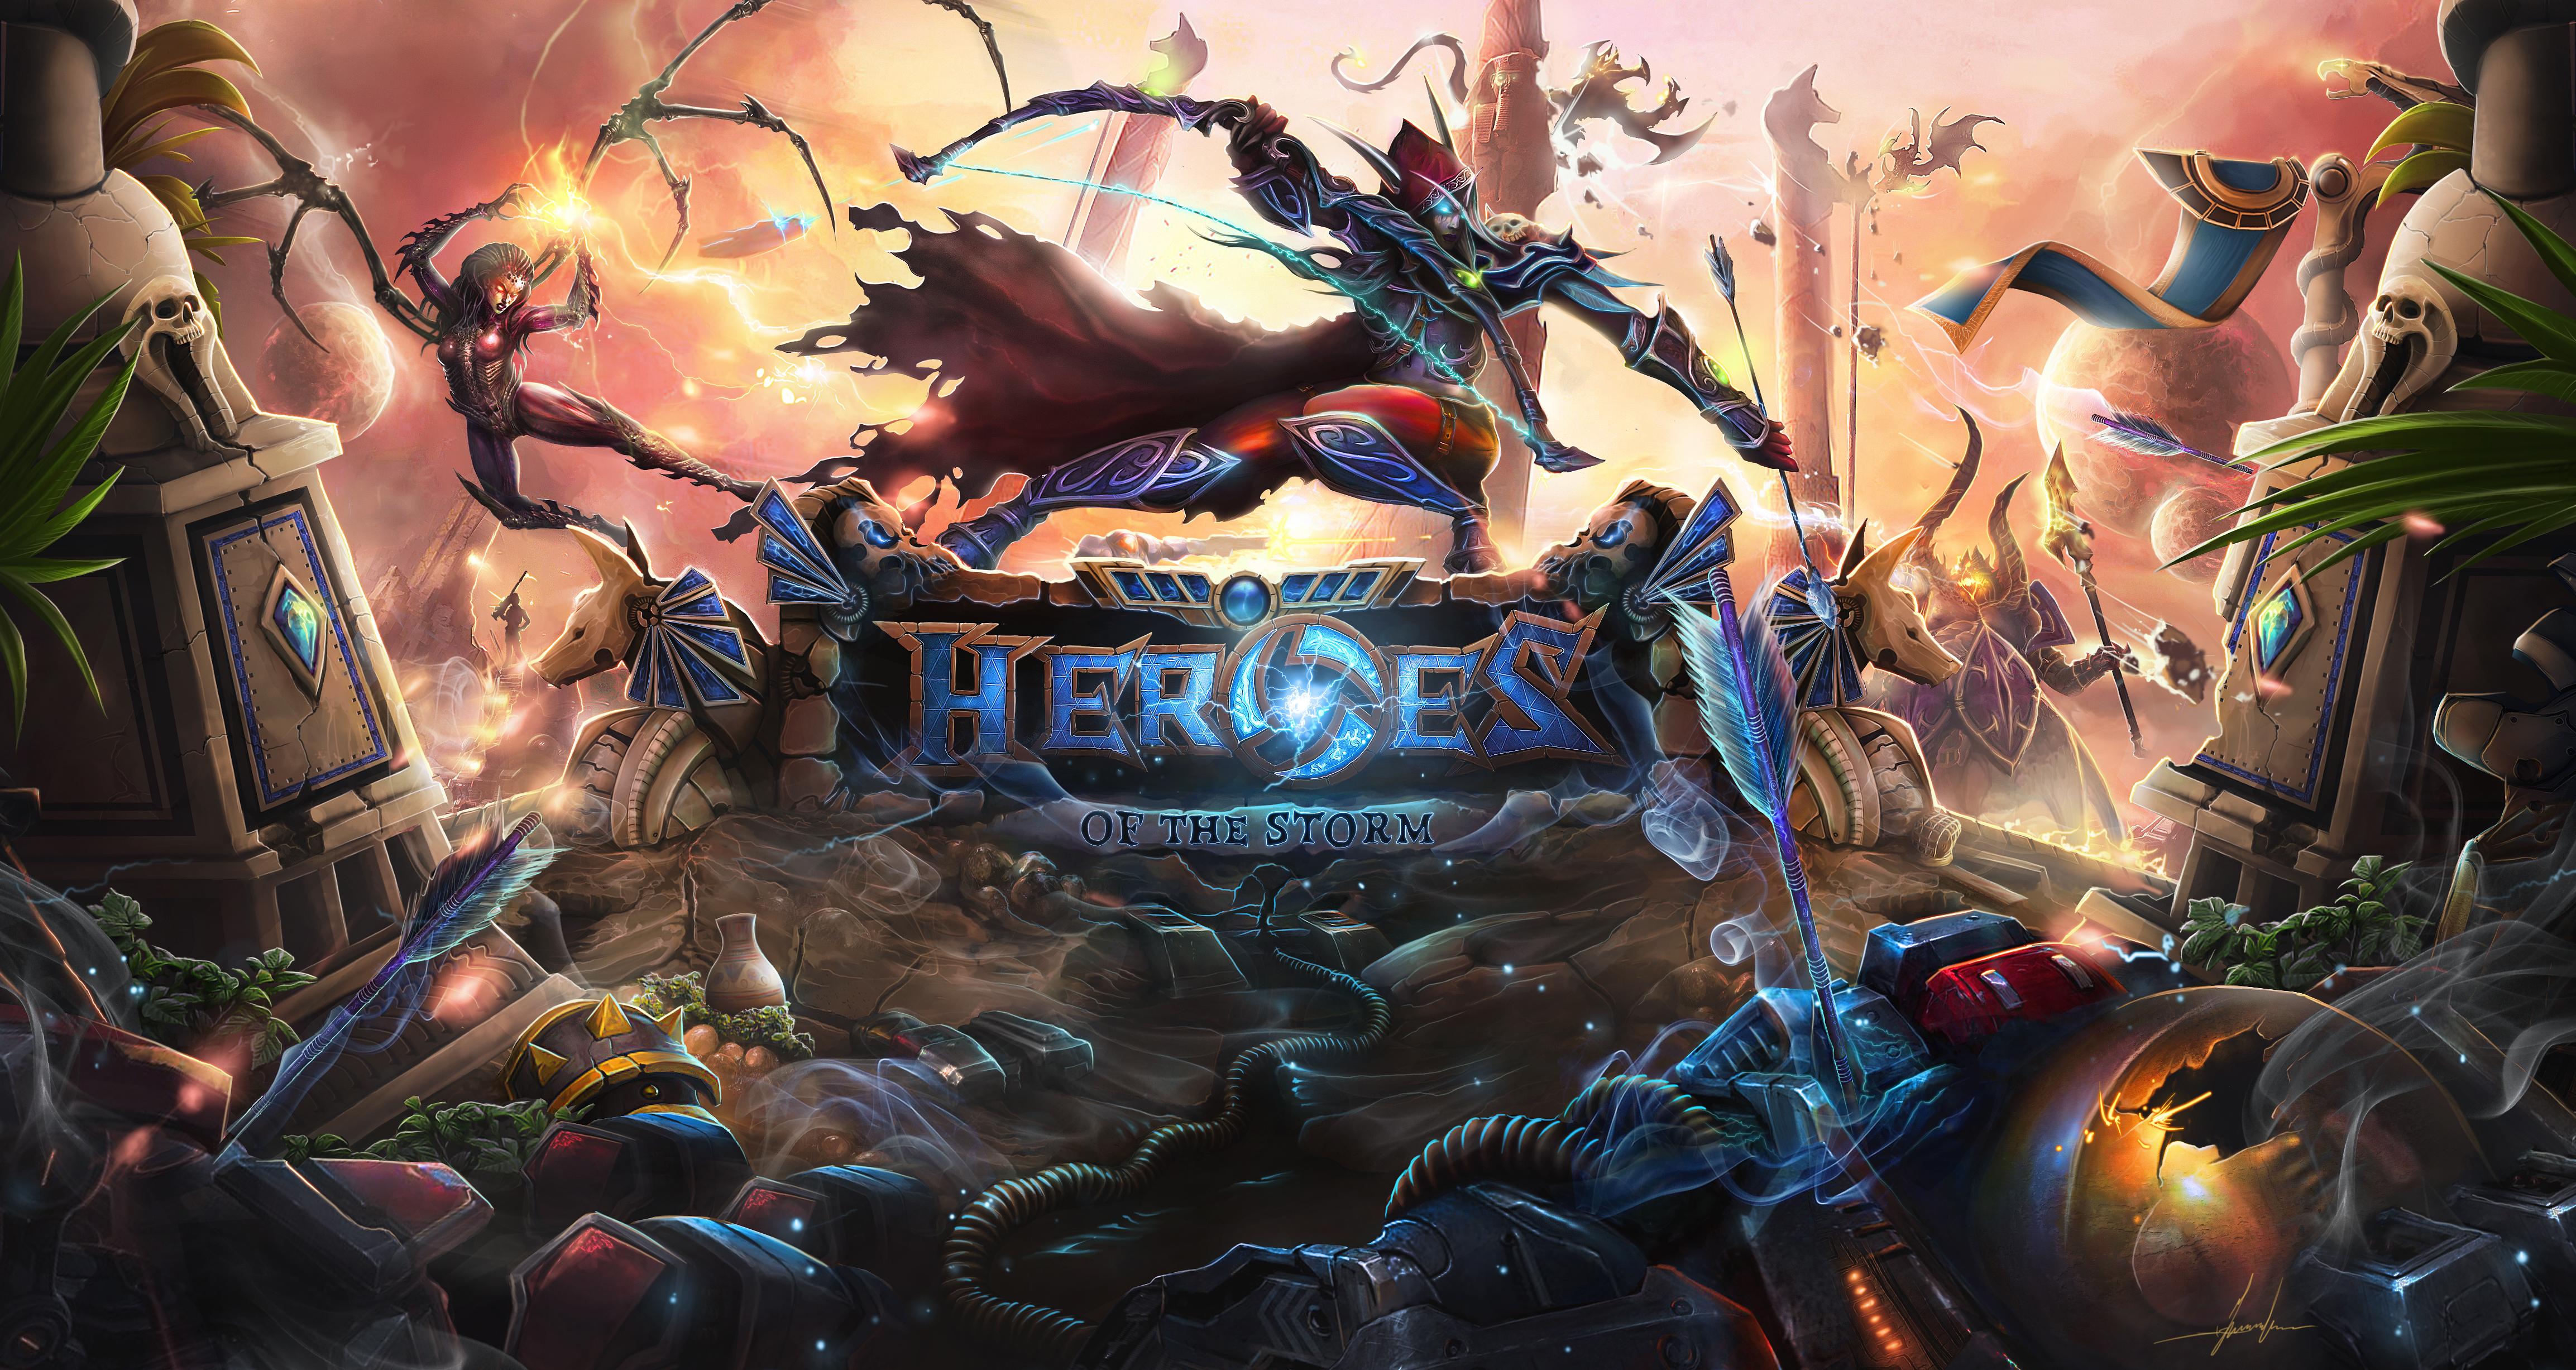 Heroes Of The Storm HD wallpapers, Desktop wallpaper - most viewed